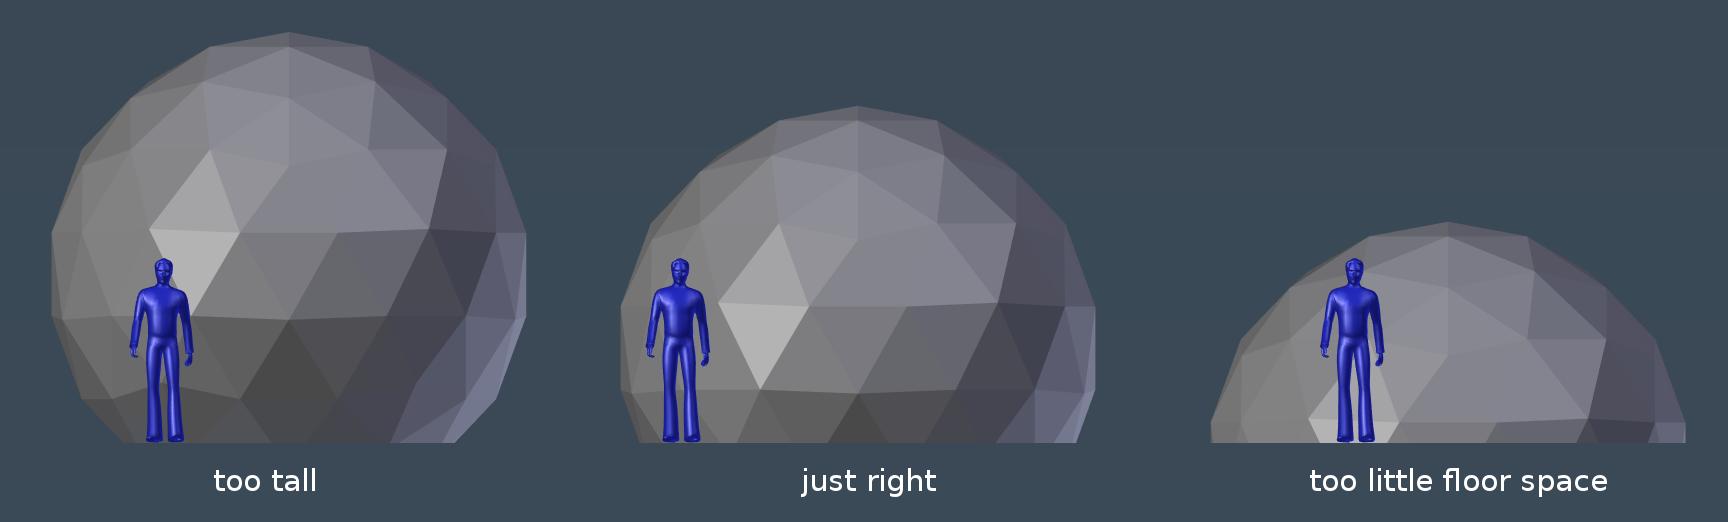 man-domes